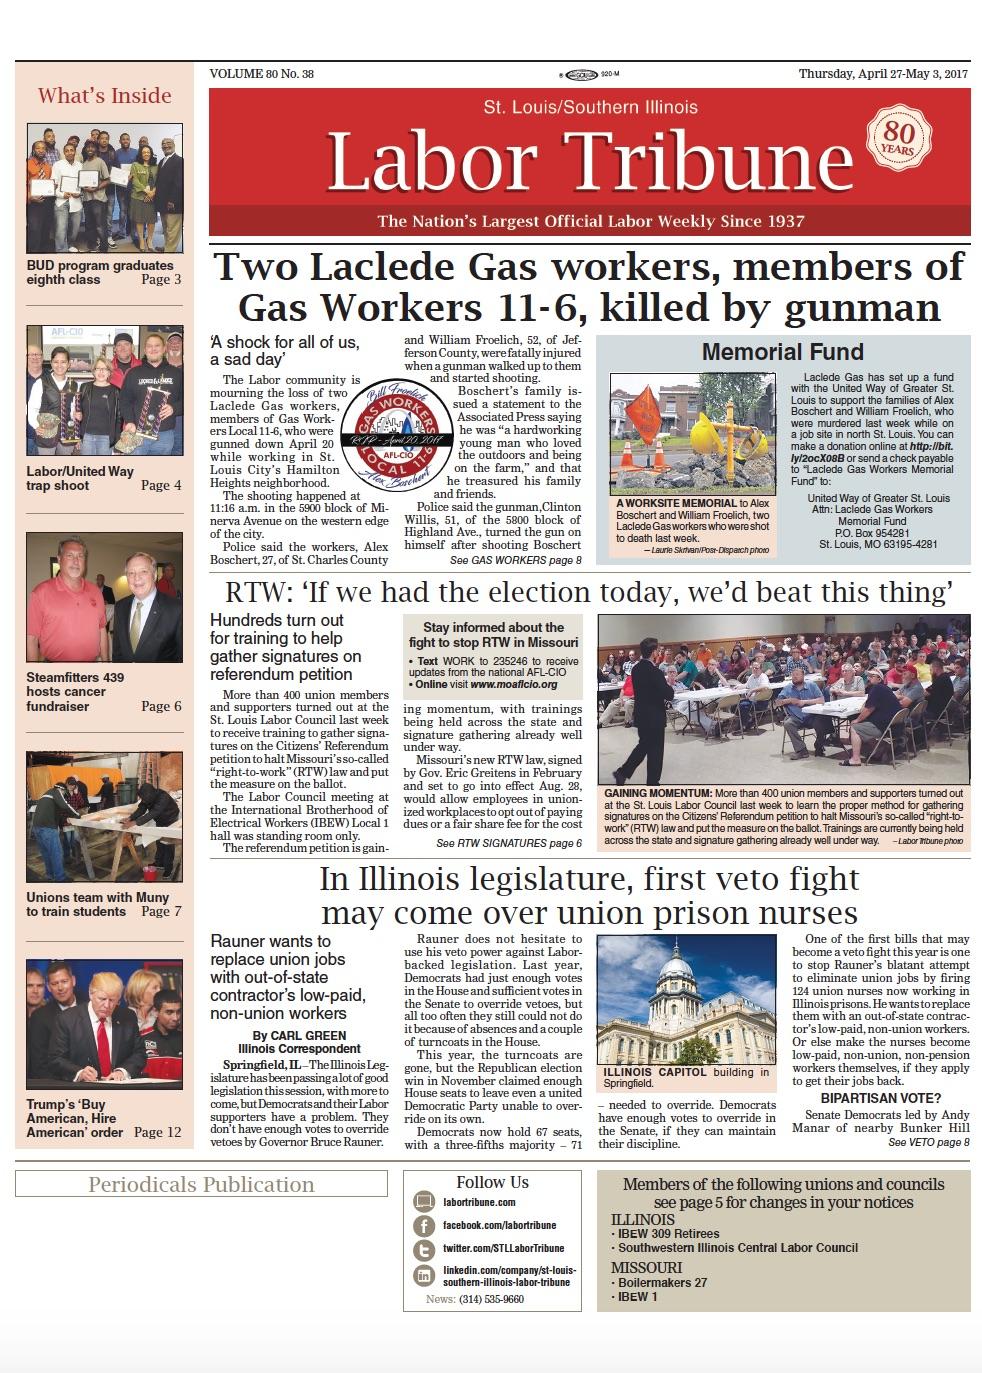 Labor Tribune